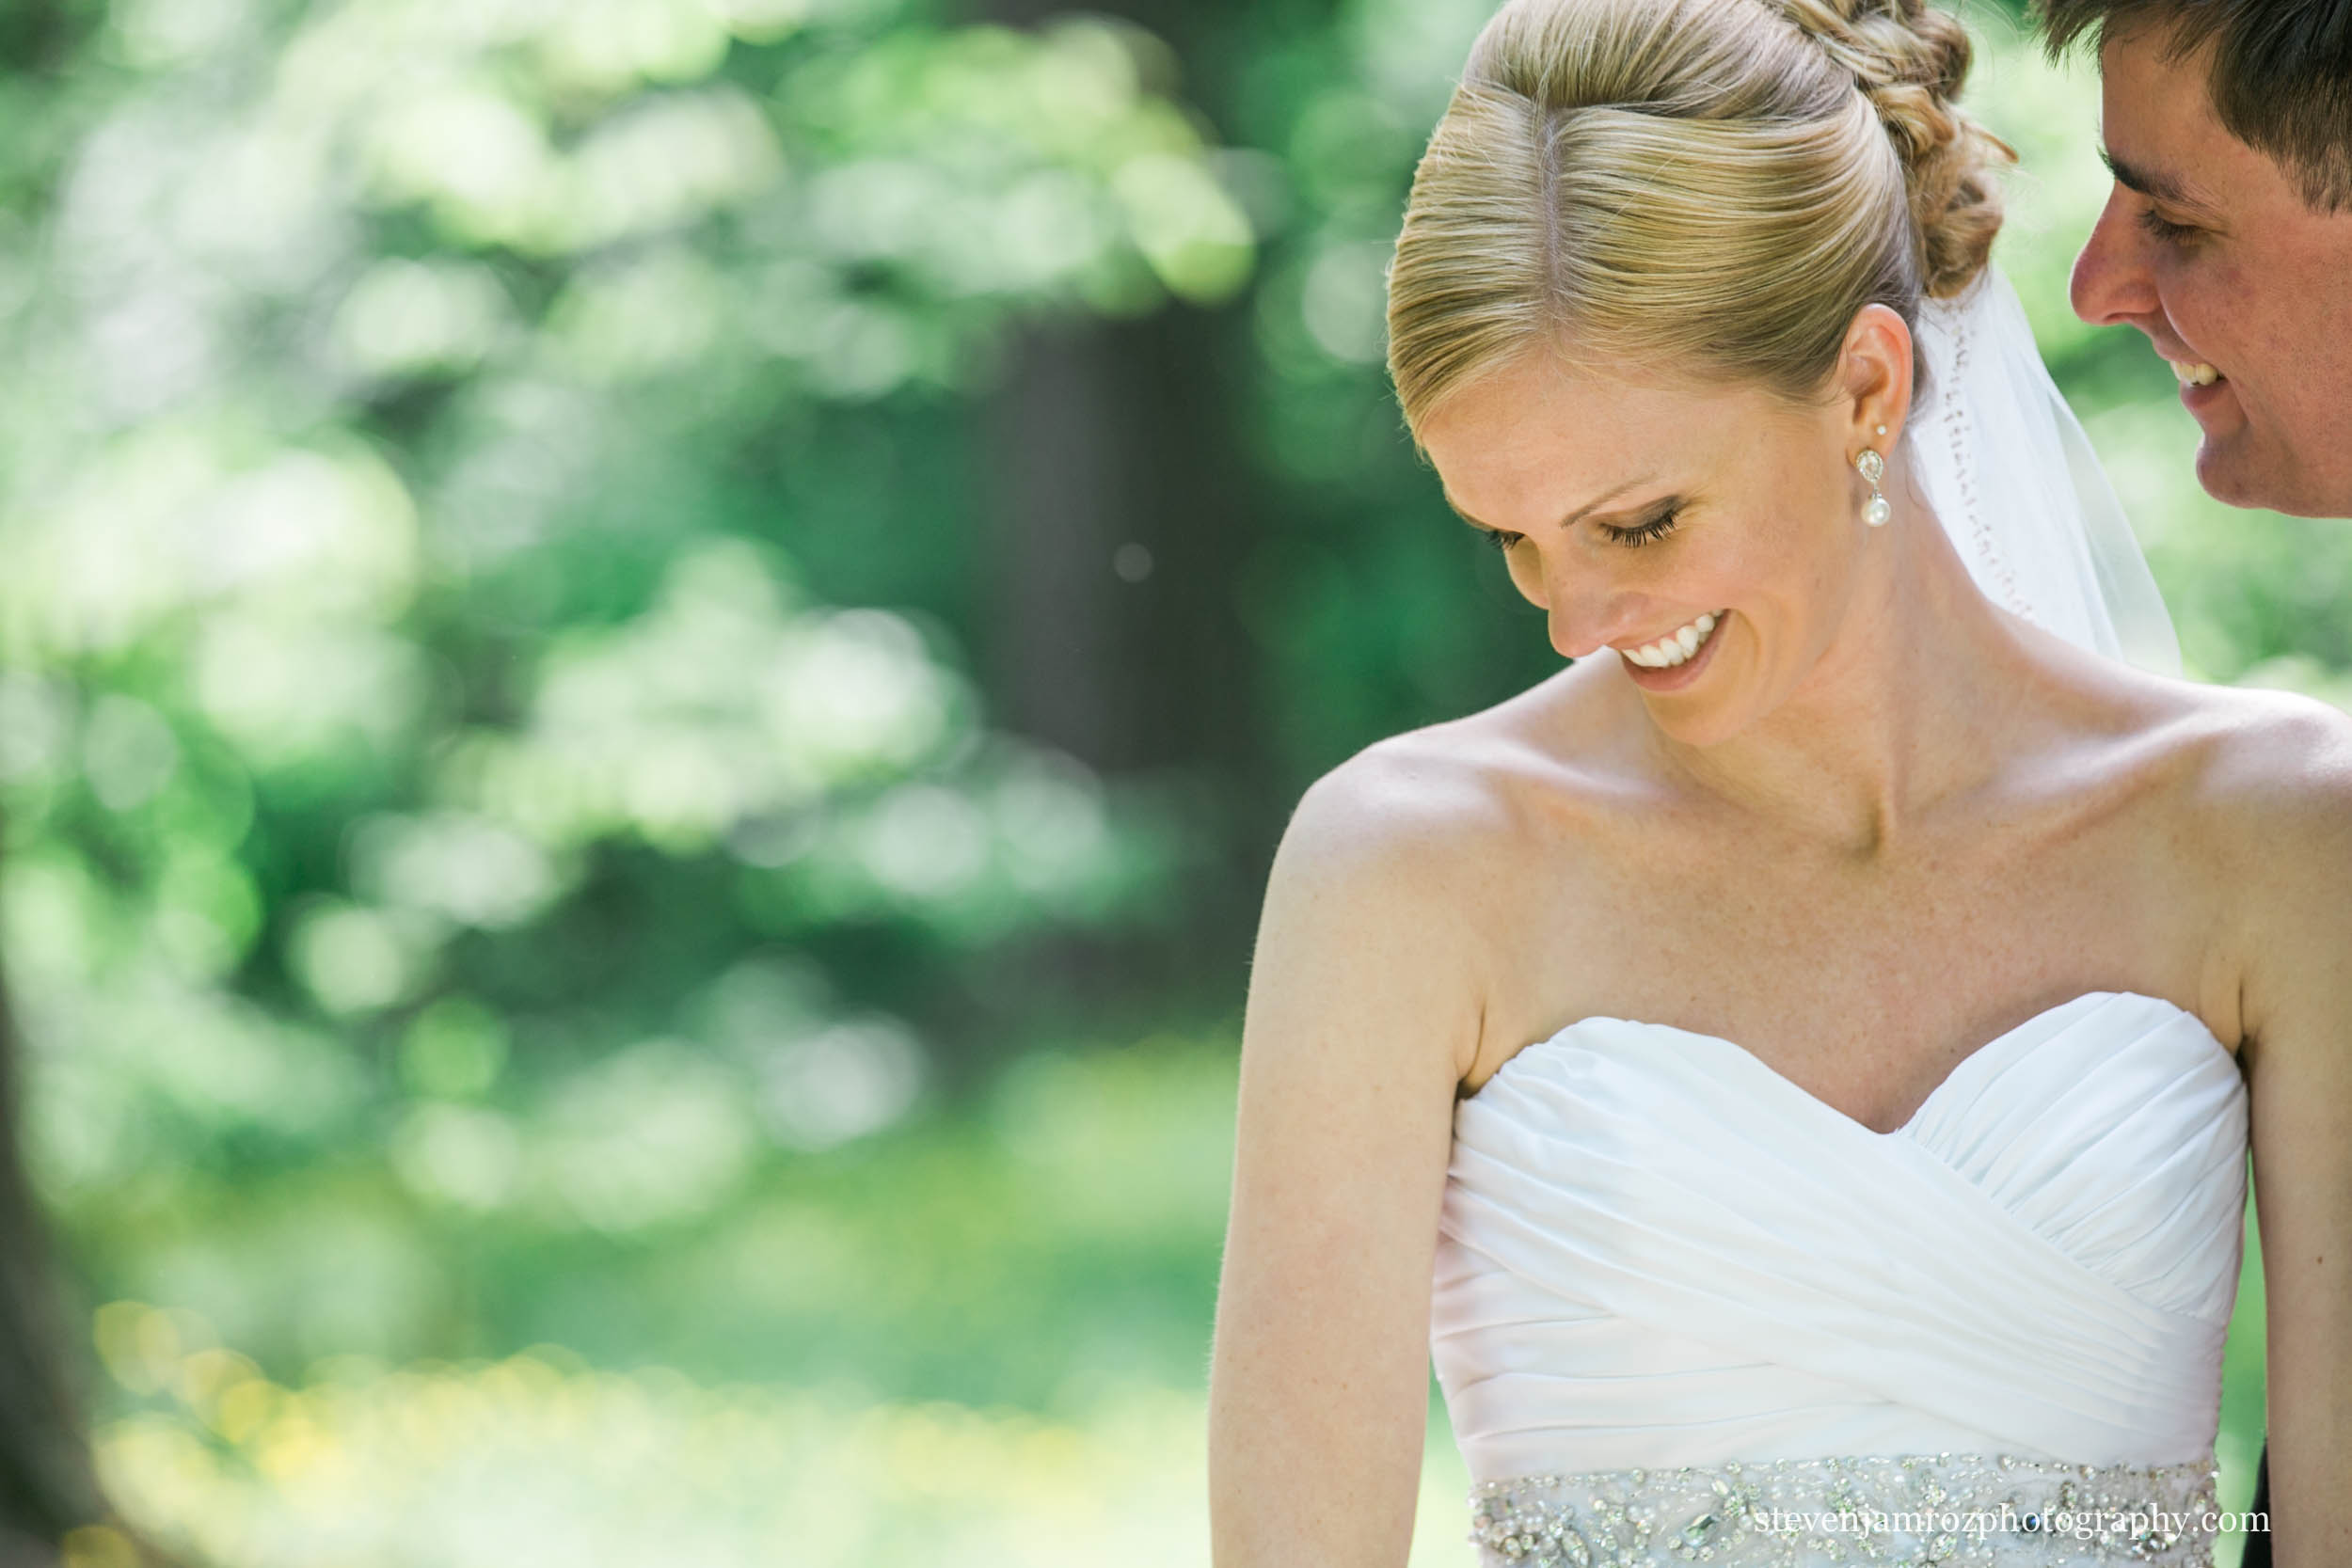 north-hills-wedding-raleigh-steven-jamroz-photography-0496.jpg